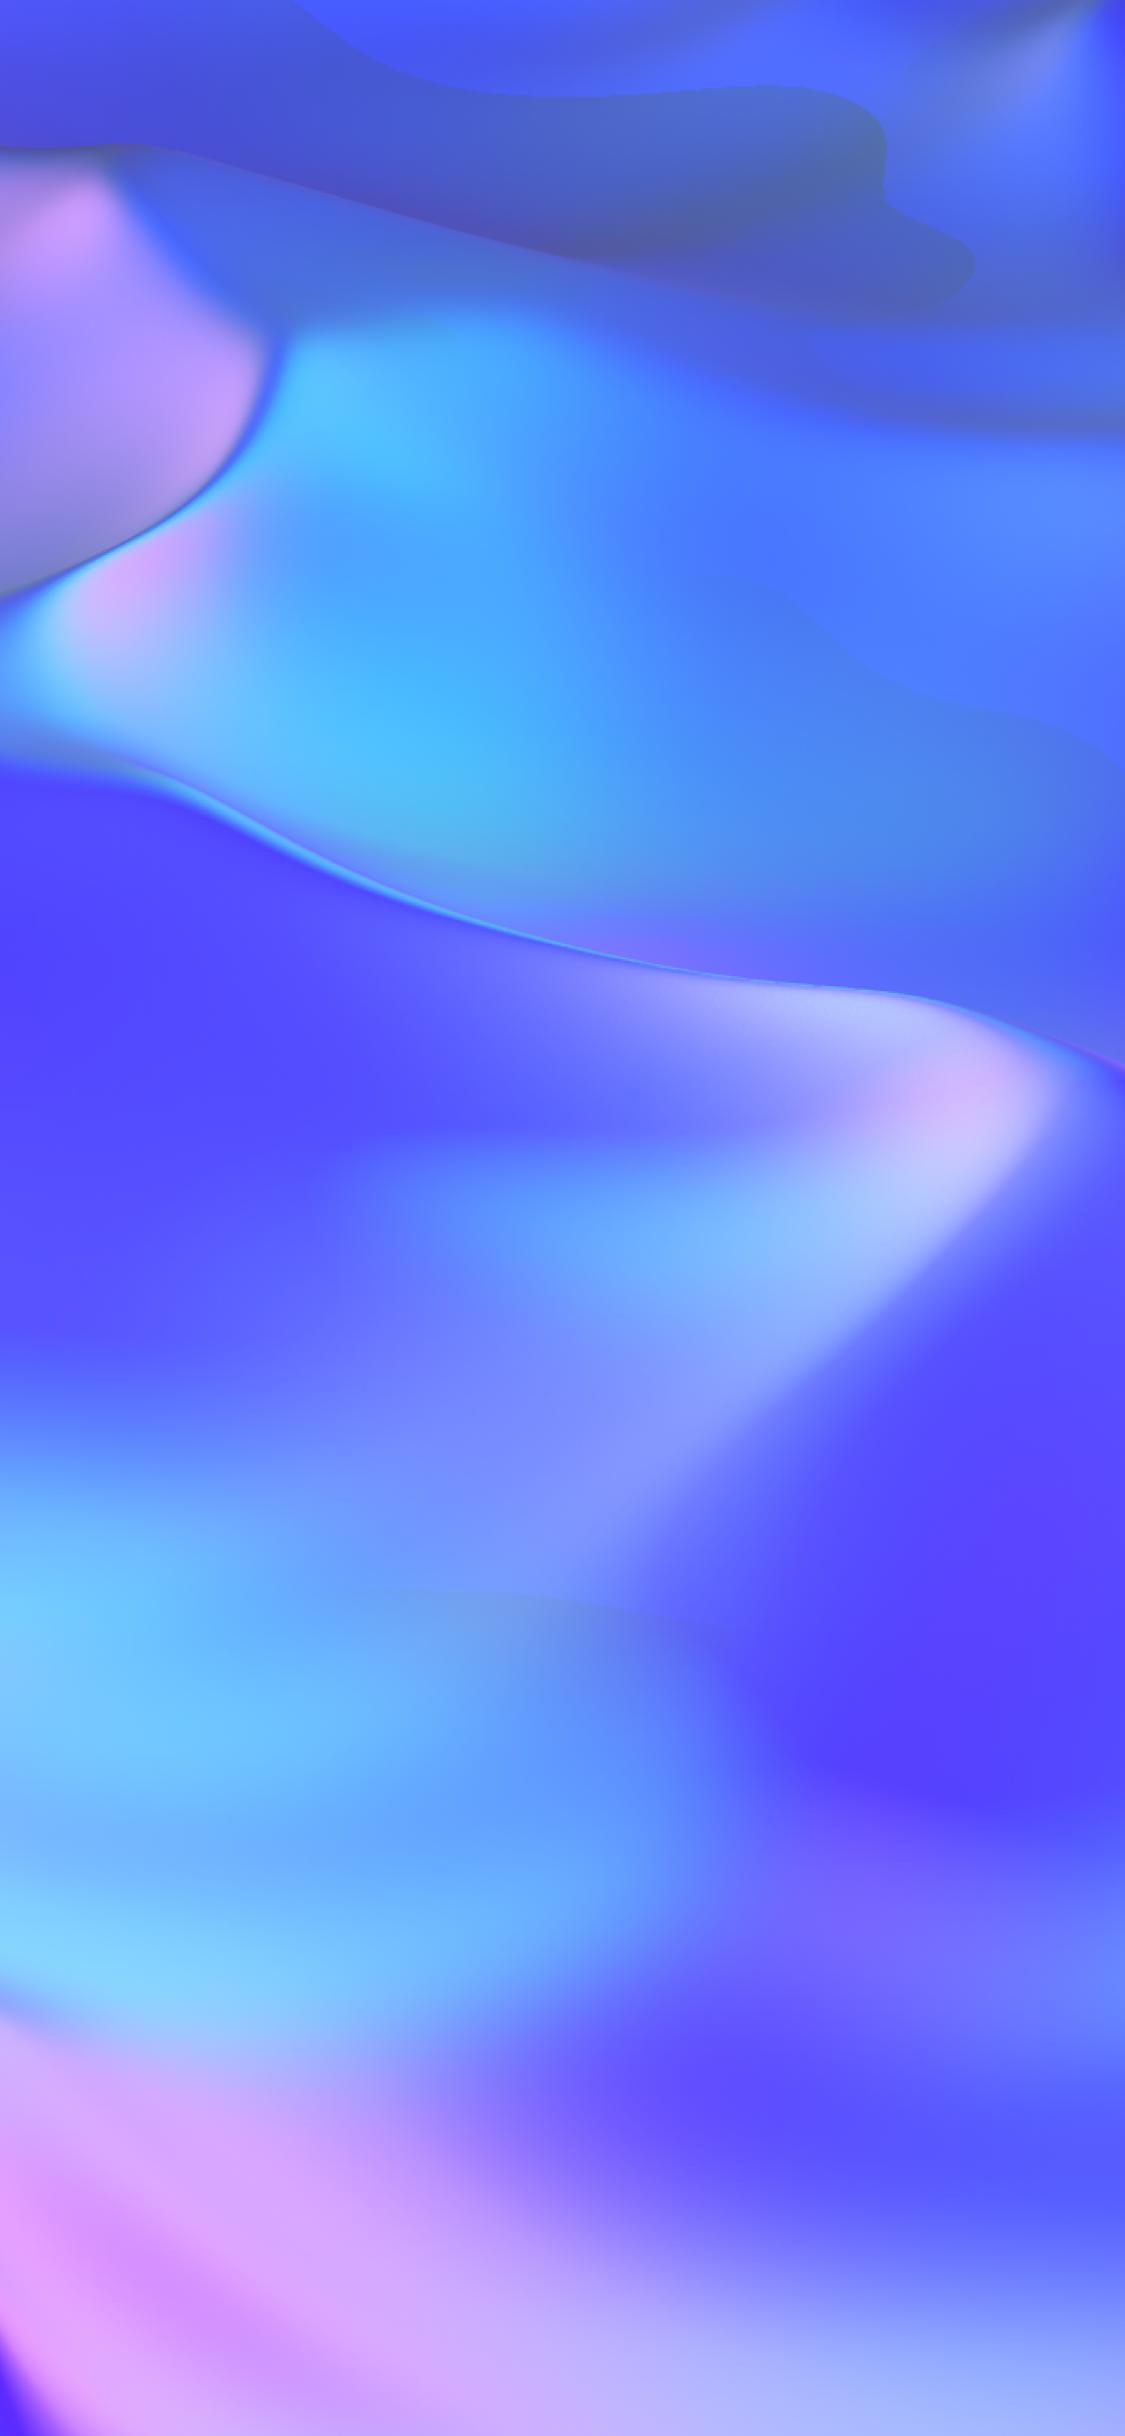 Phone wallpaper by Elena Totaj on graphic design Iphone